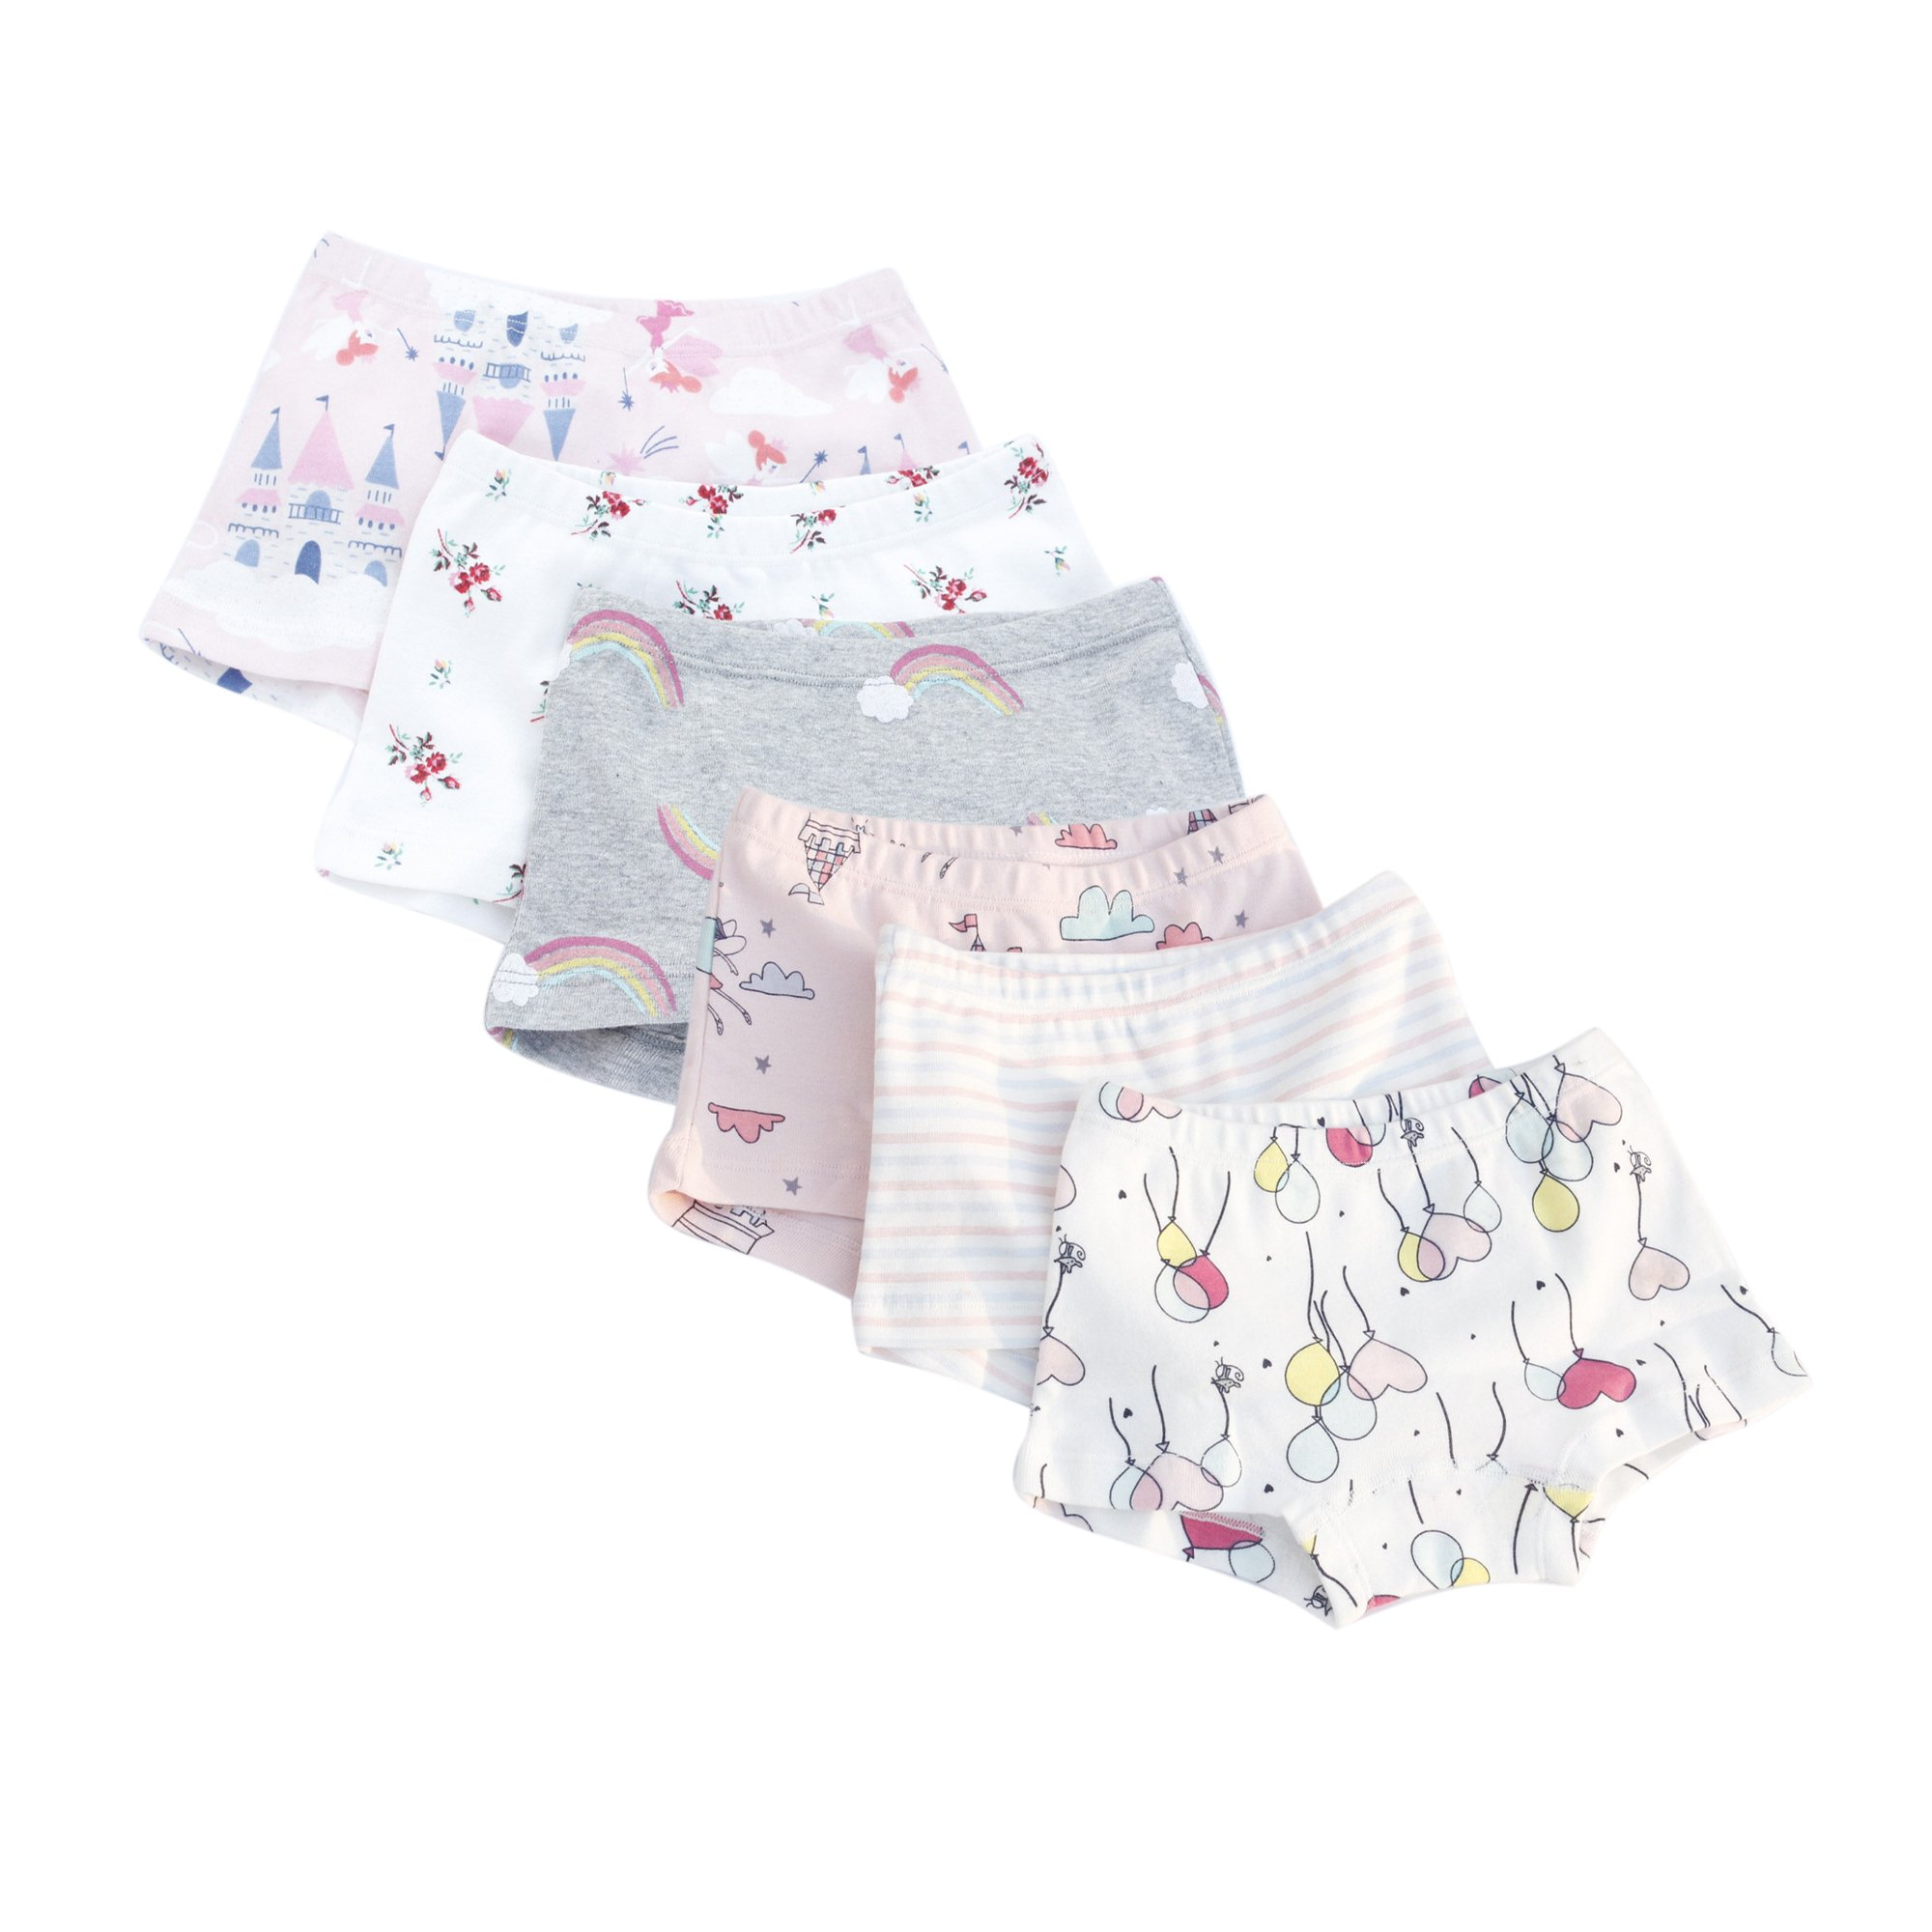 BOBO Kids Girls' Boyshort Underwear Printed Cotton Briefs Panties Set (Pack of 6) Size 3-4 Years